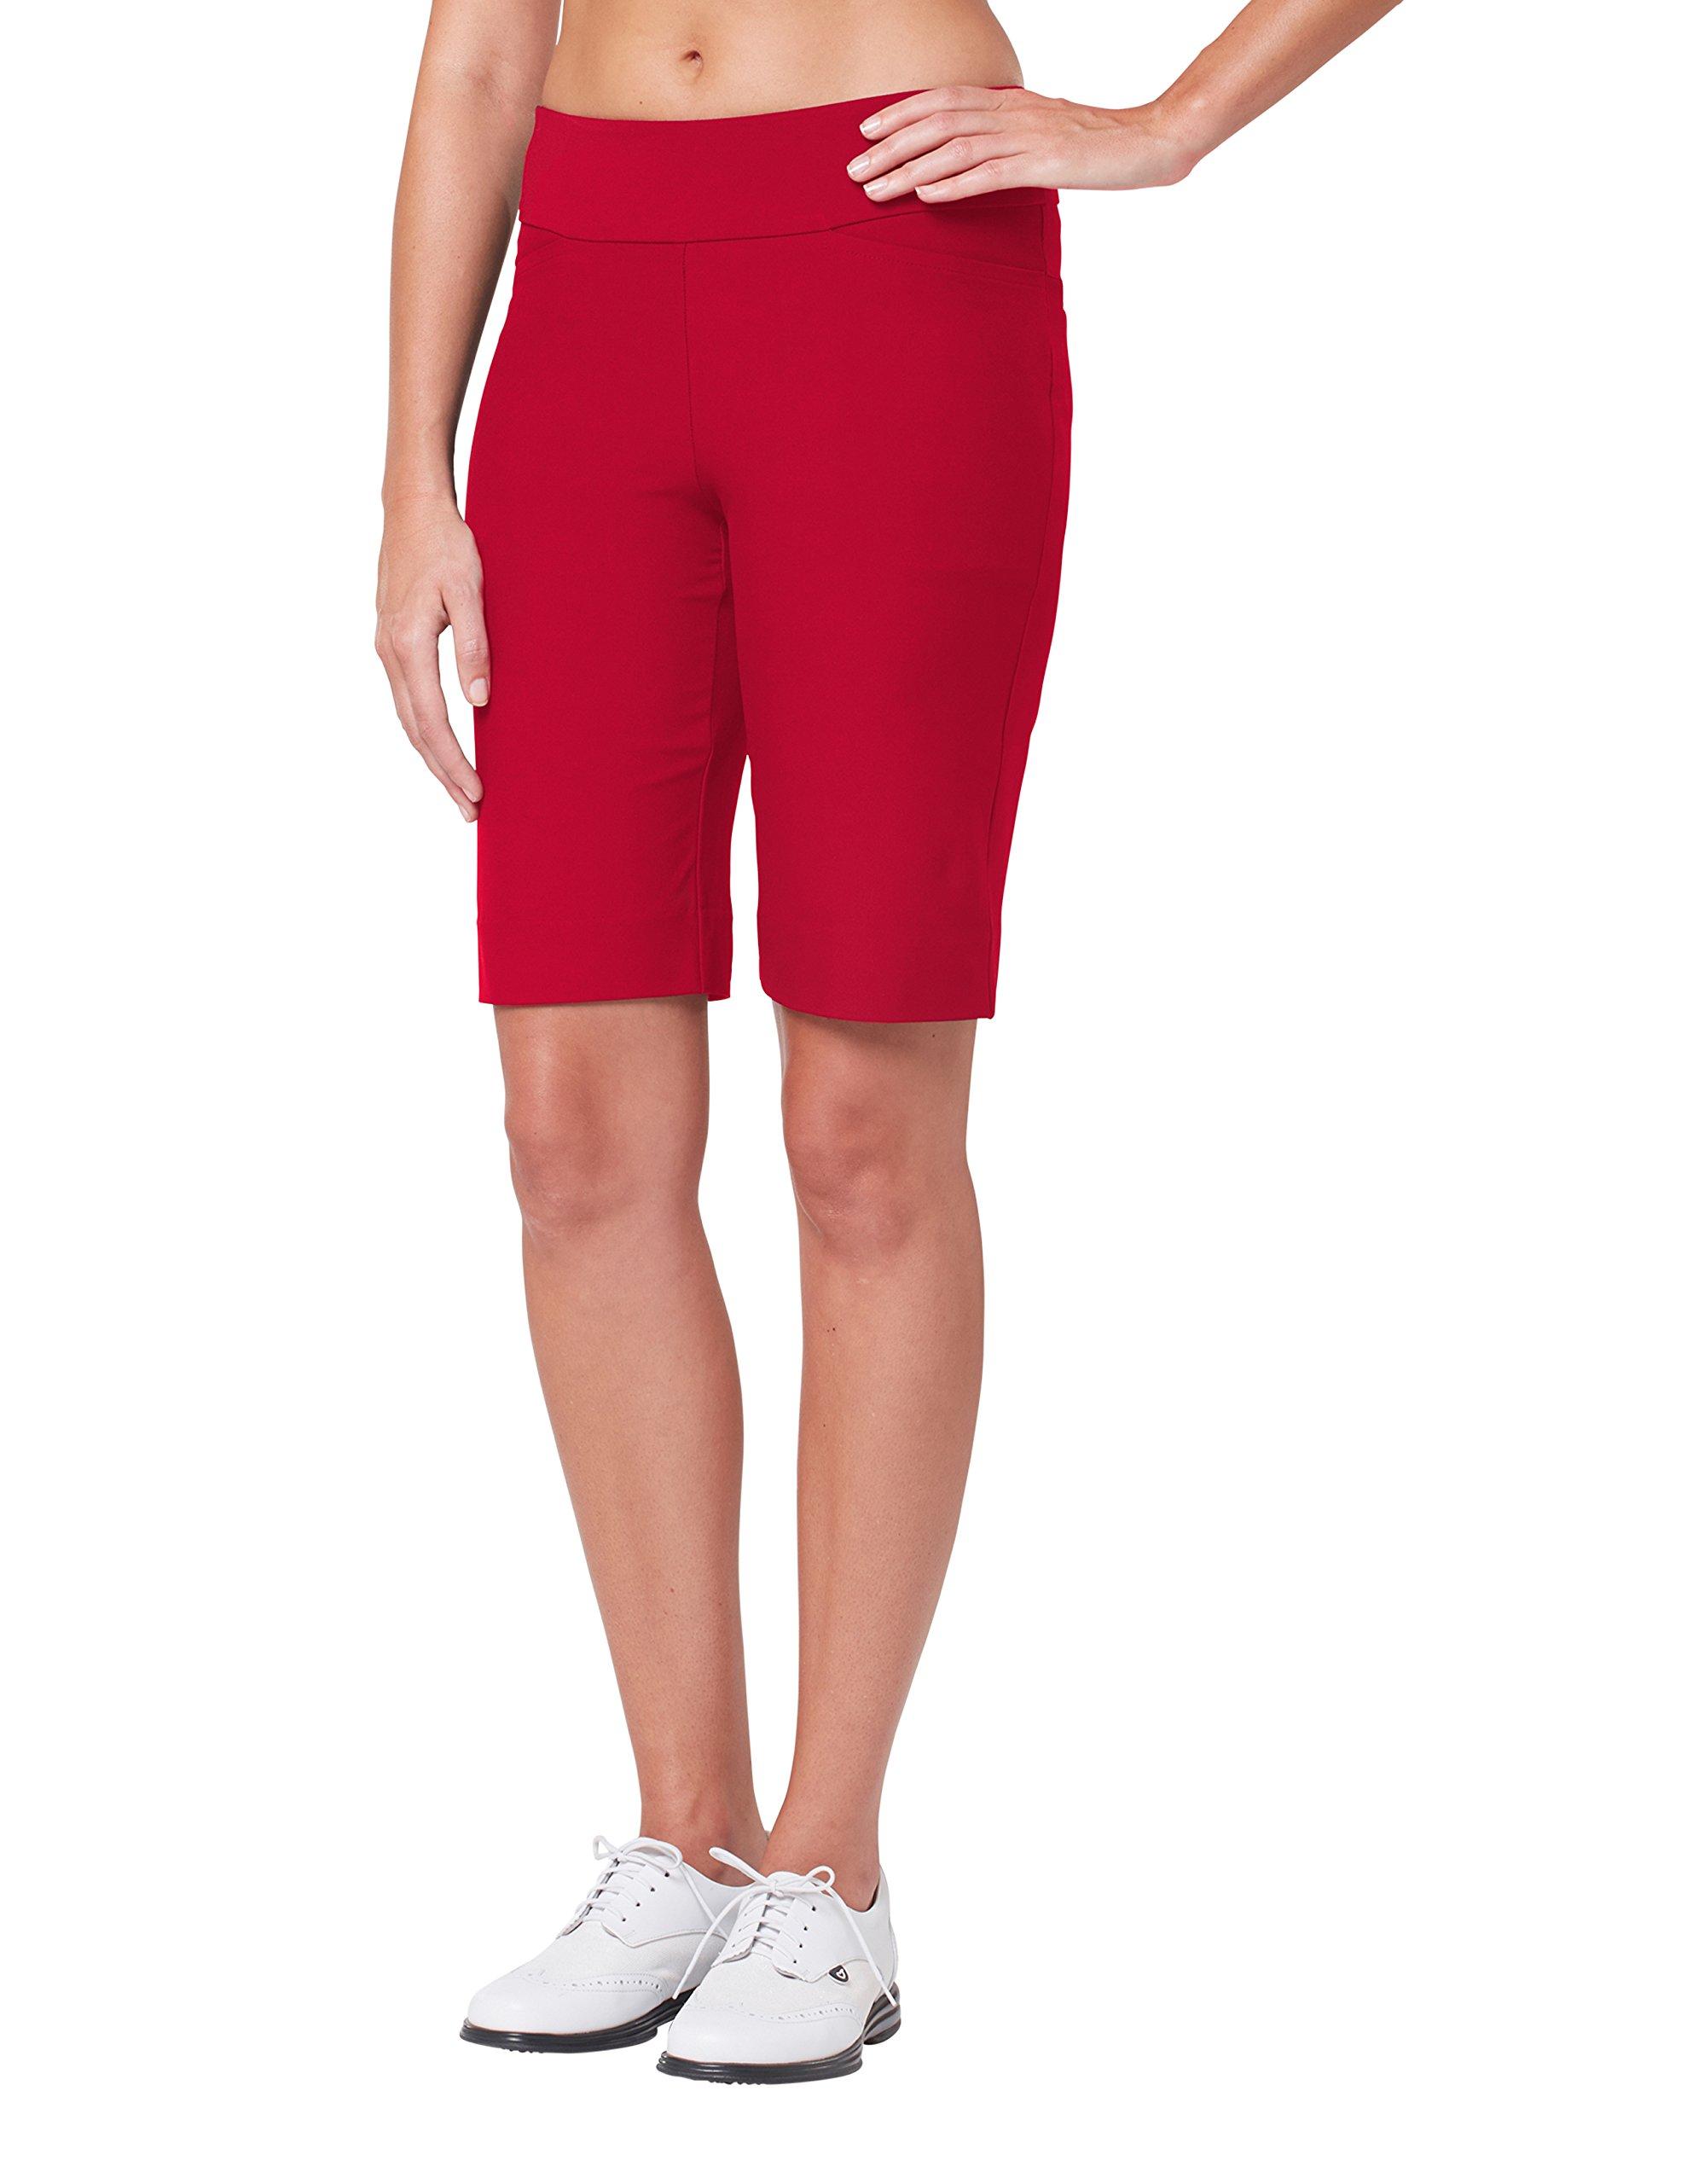 Tail Activewear Women's Mulligan Short 4 Red